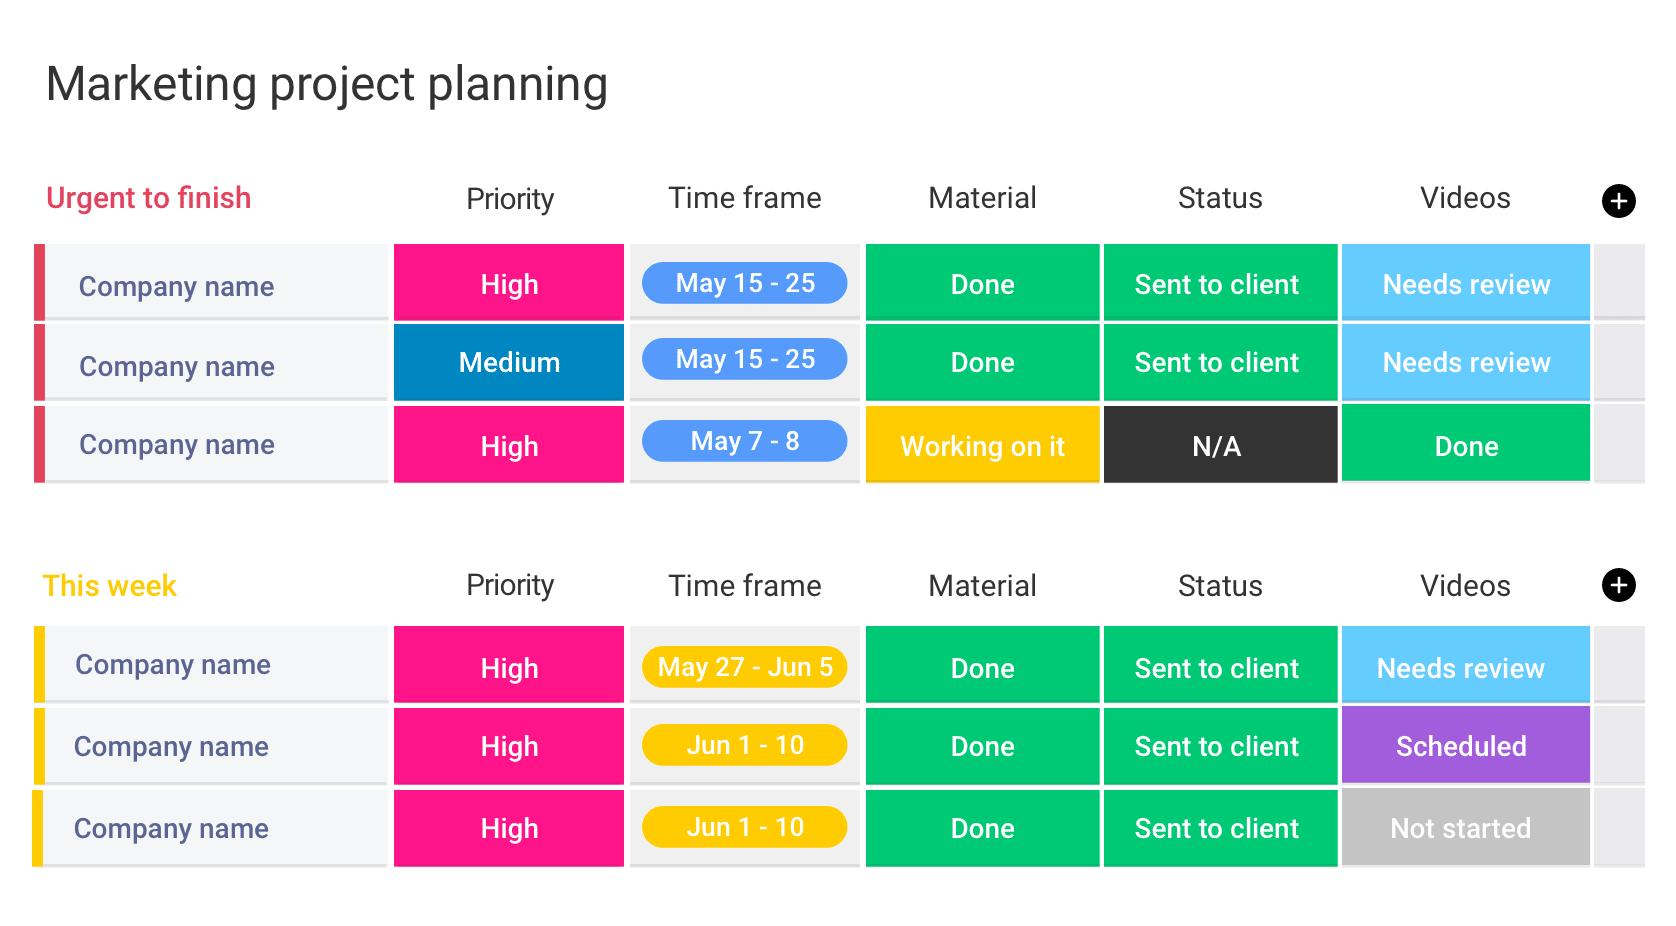 Marketingplanning2x.png